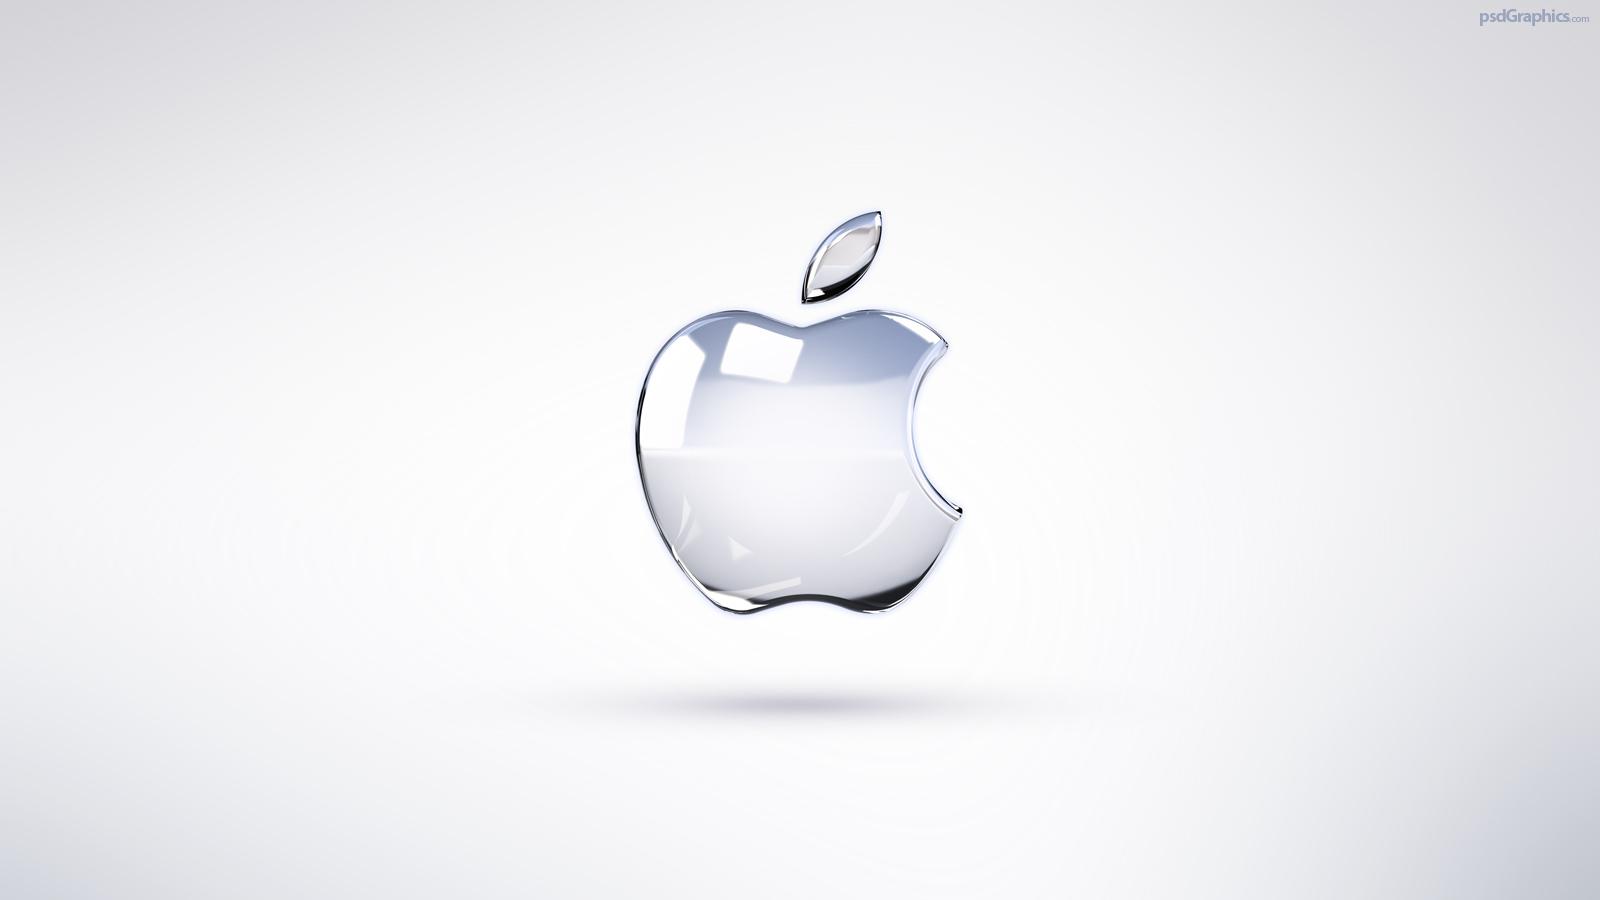 Bright Apple logo wallpaper PSDGraphics 1600x900